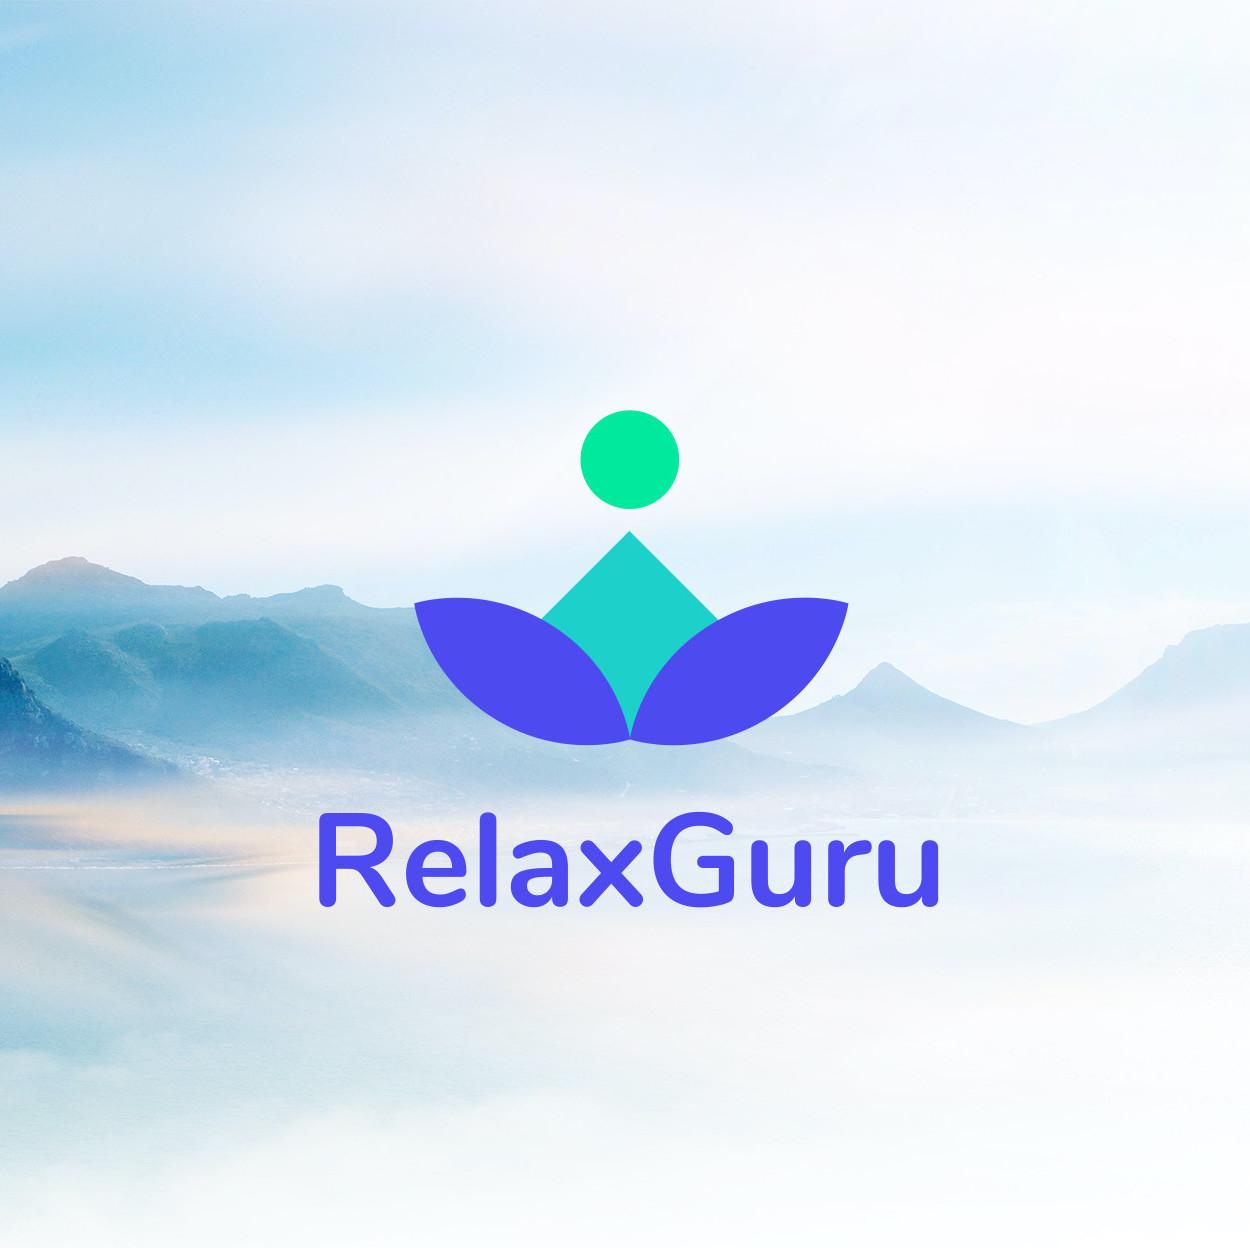 Relax Guru (Meditations App) - kostenloser Probemonat (danach 4,99€ / Monat)